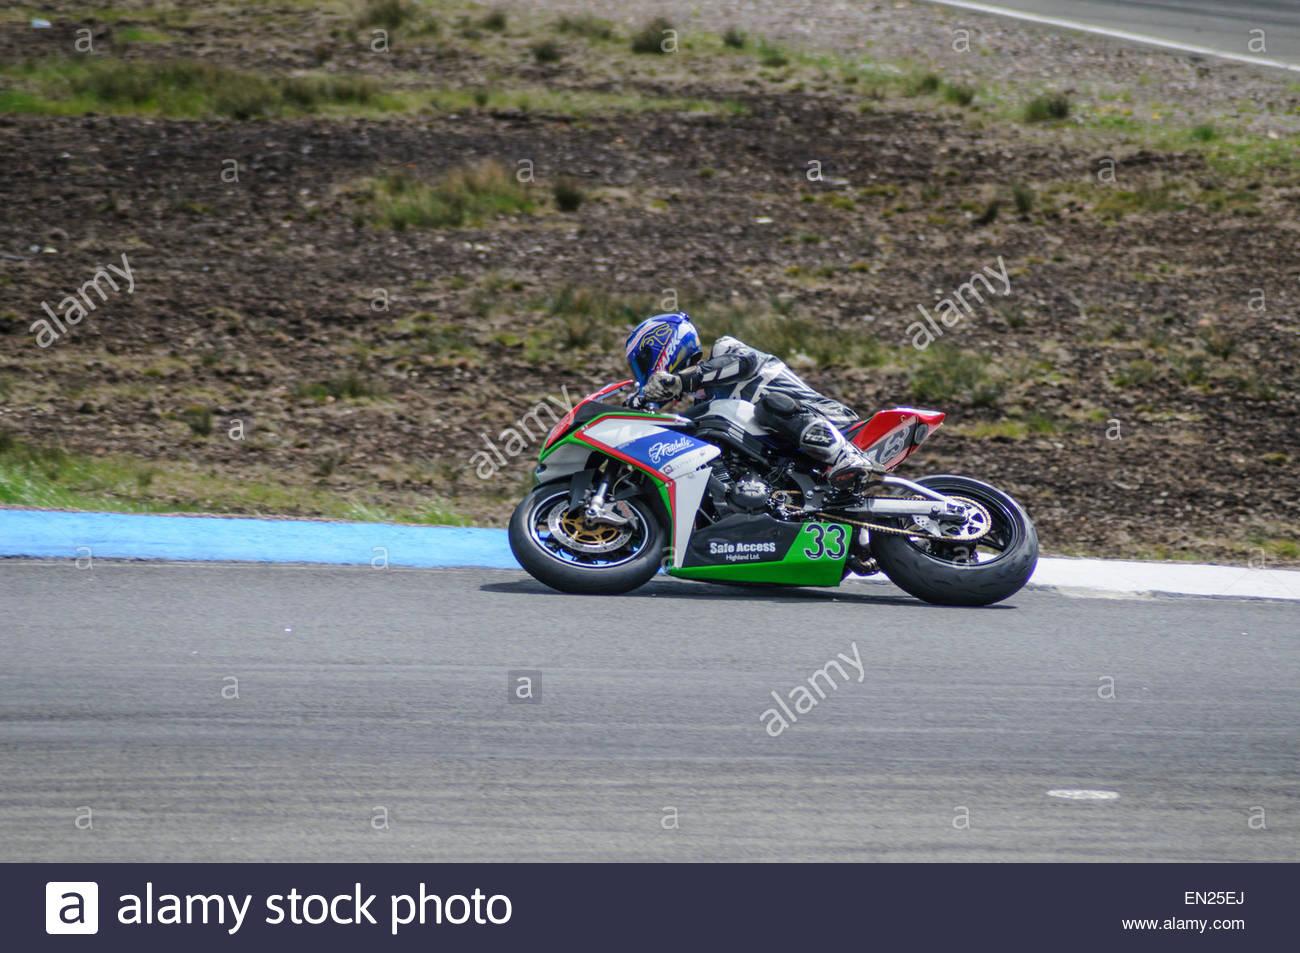 Dunfermline Uk 26 April 2015 Adrian Clark Kawasaki Er6 Exits The